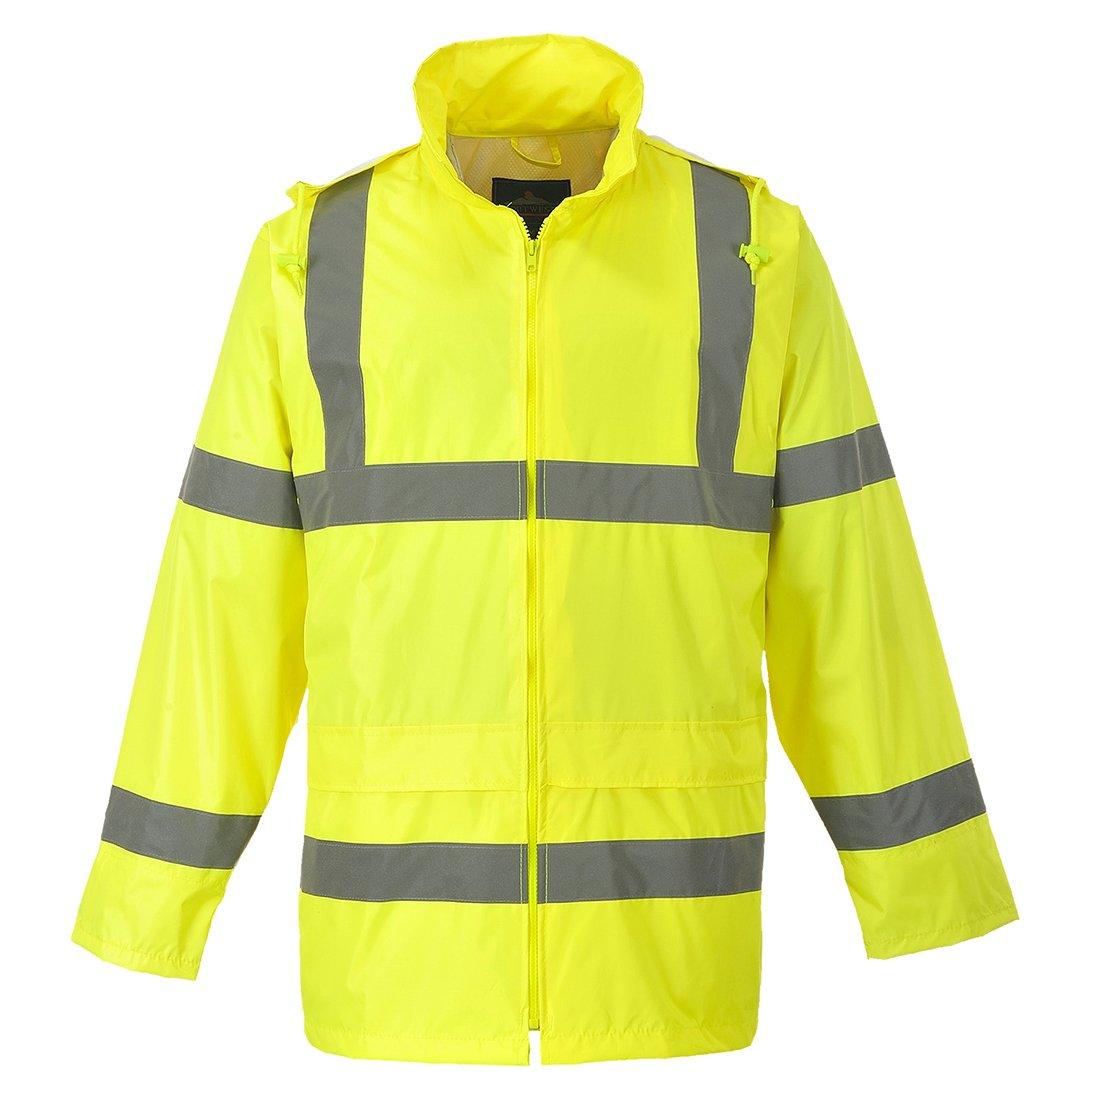 Portwest Waterproof Rain Jacket, Lightweight, Yellow, Medium by Portwest (Image #2)